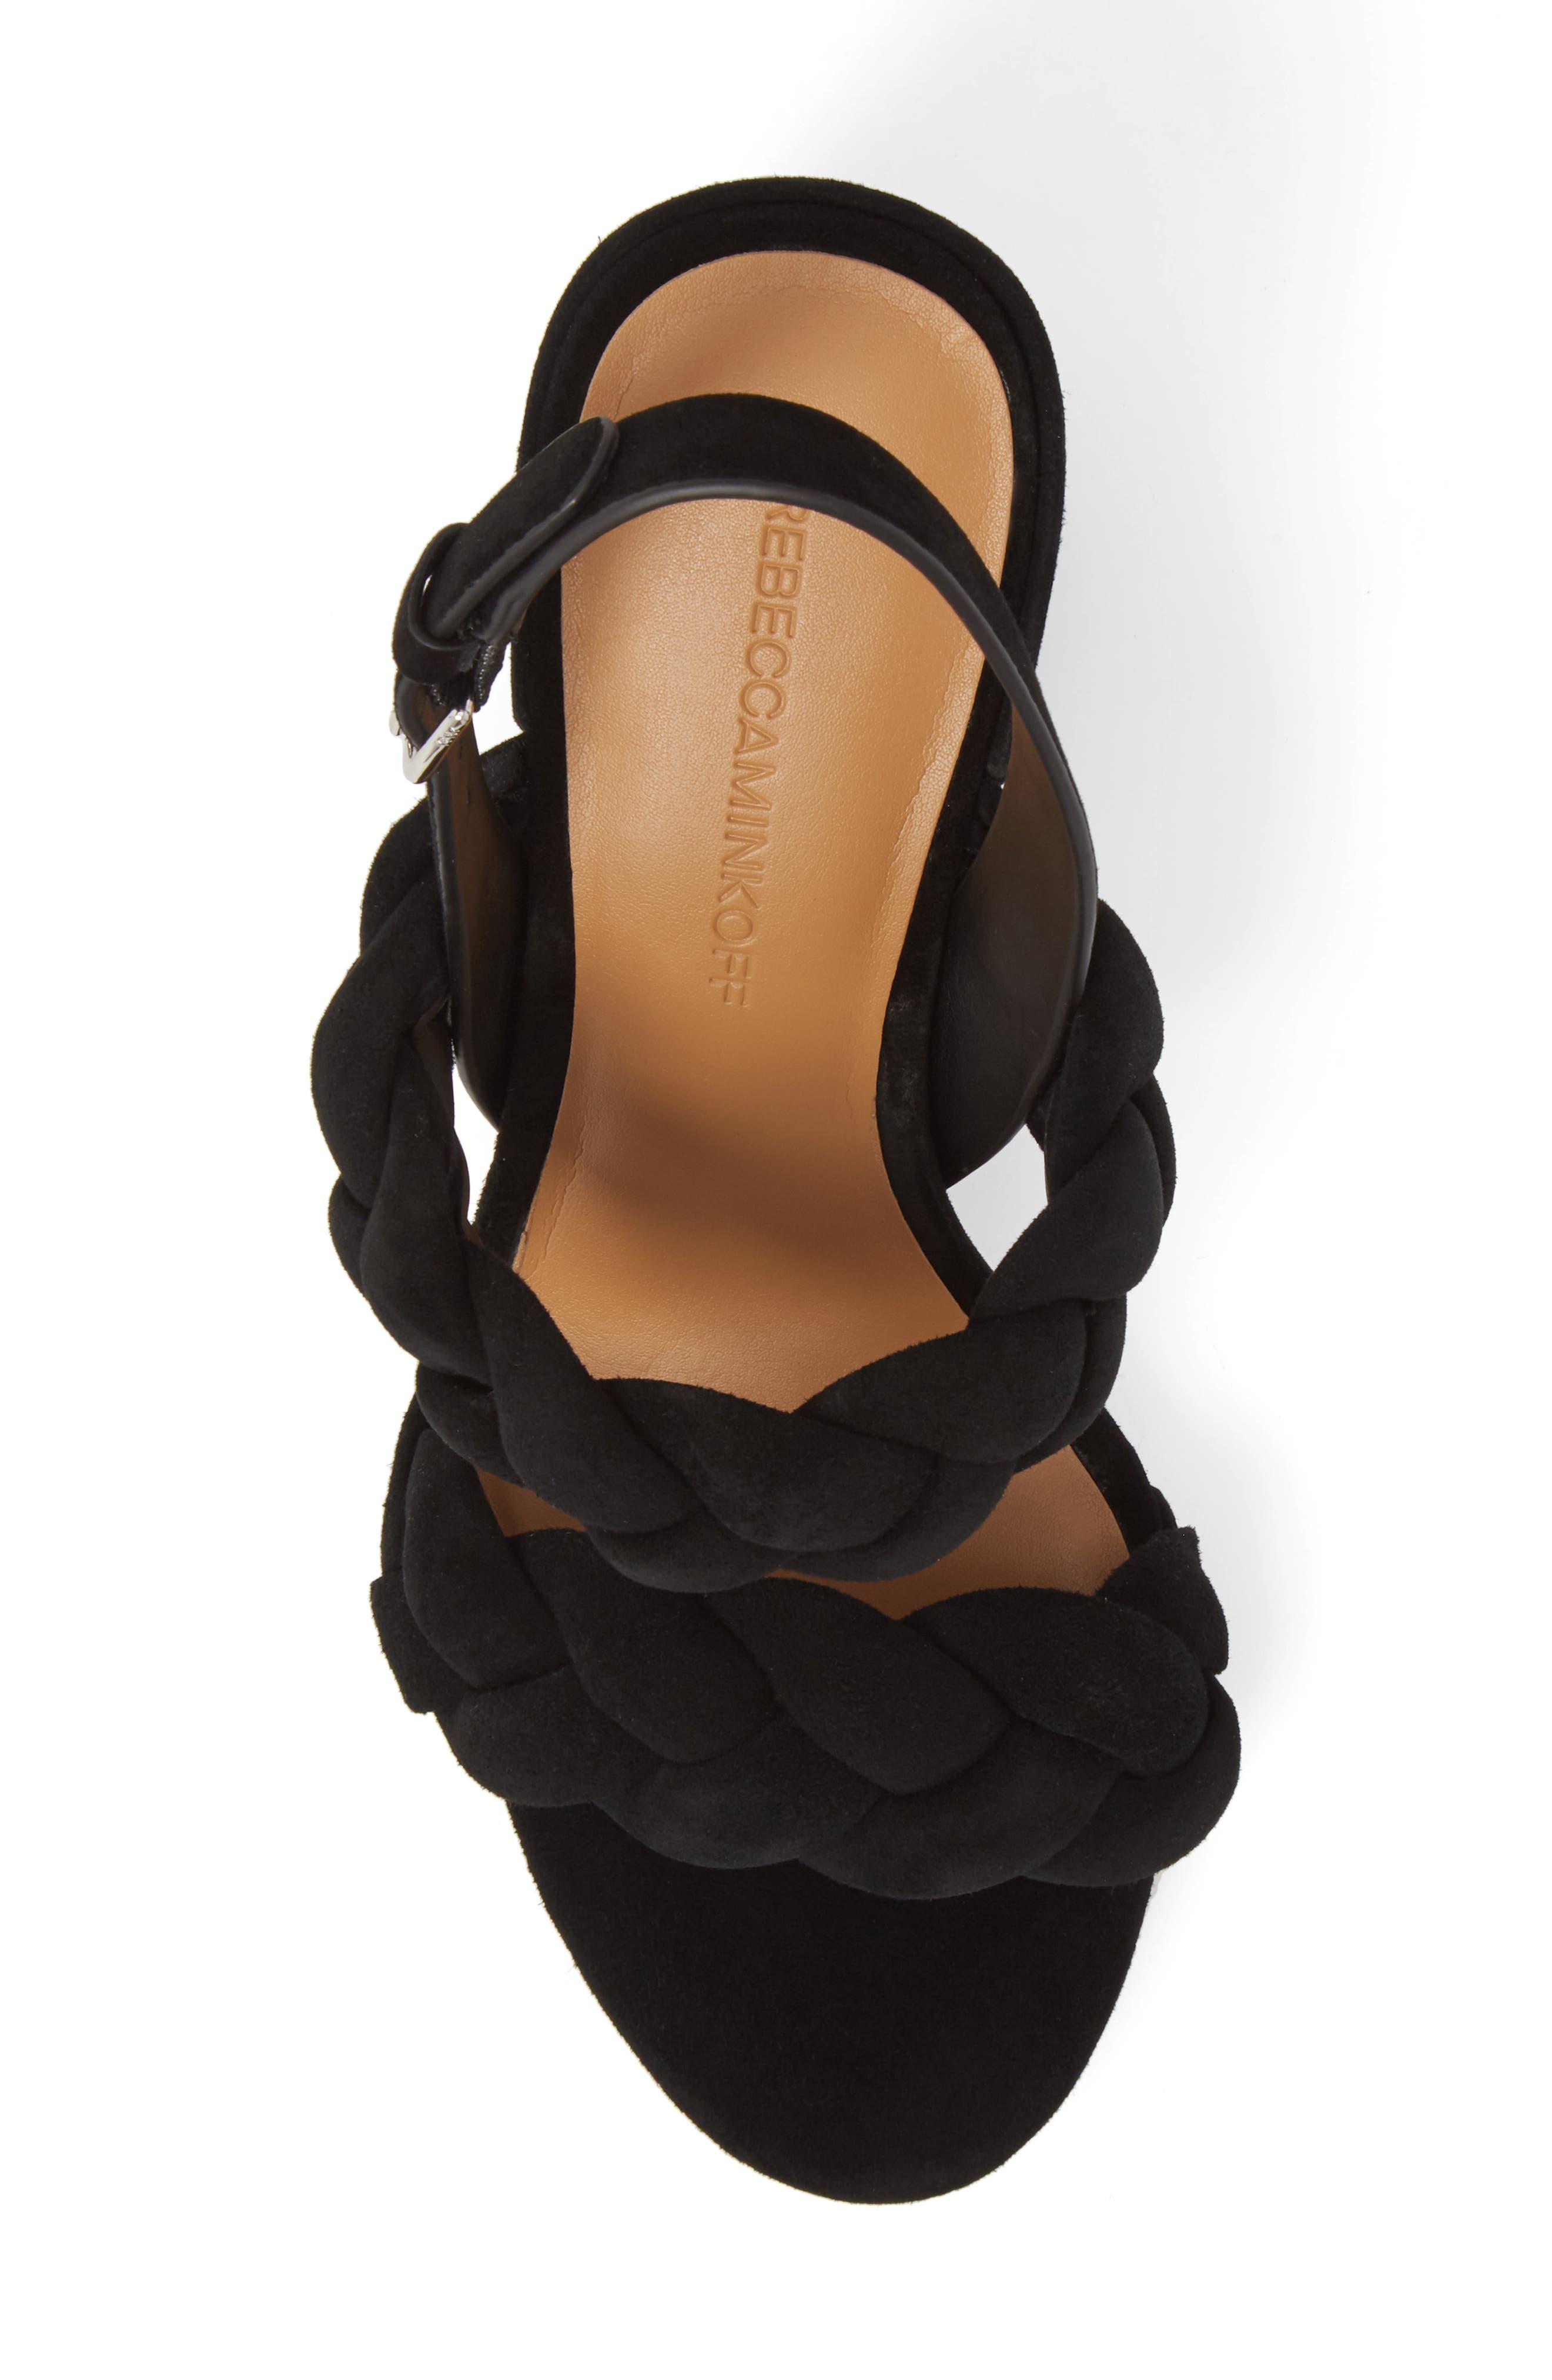 Candance Block Heel Sandal,                             Alternate thumbnail 5, color,                             BLACK LEATHER